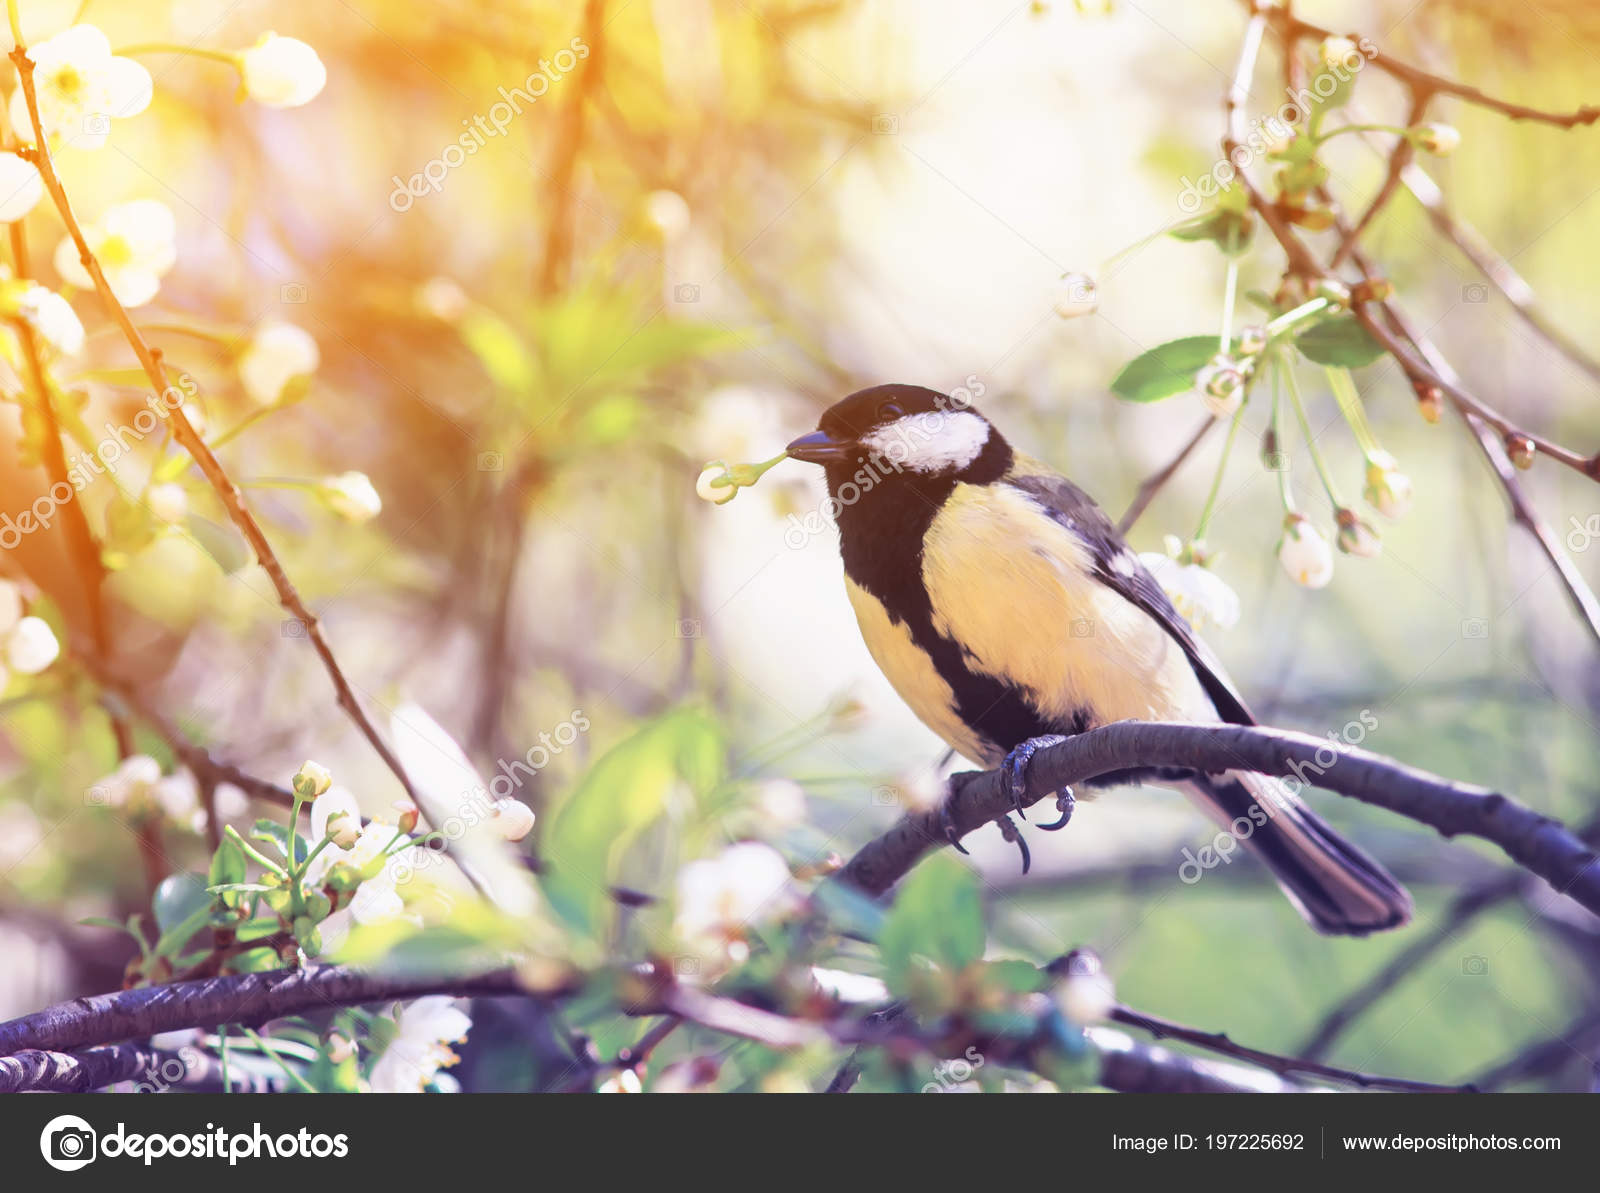 Милая птица синица сидя саду ветку вишни белые весенние цветы.